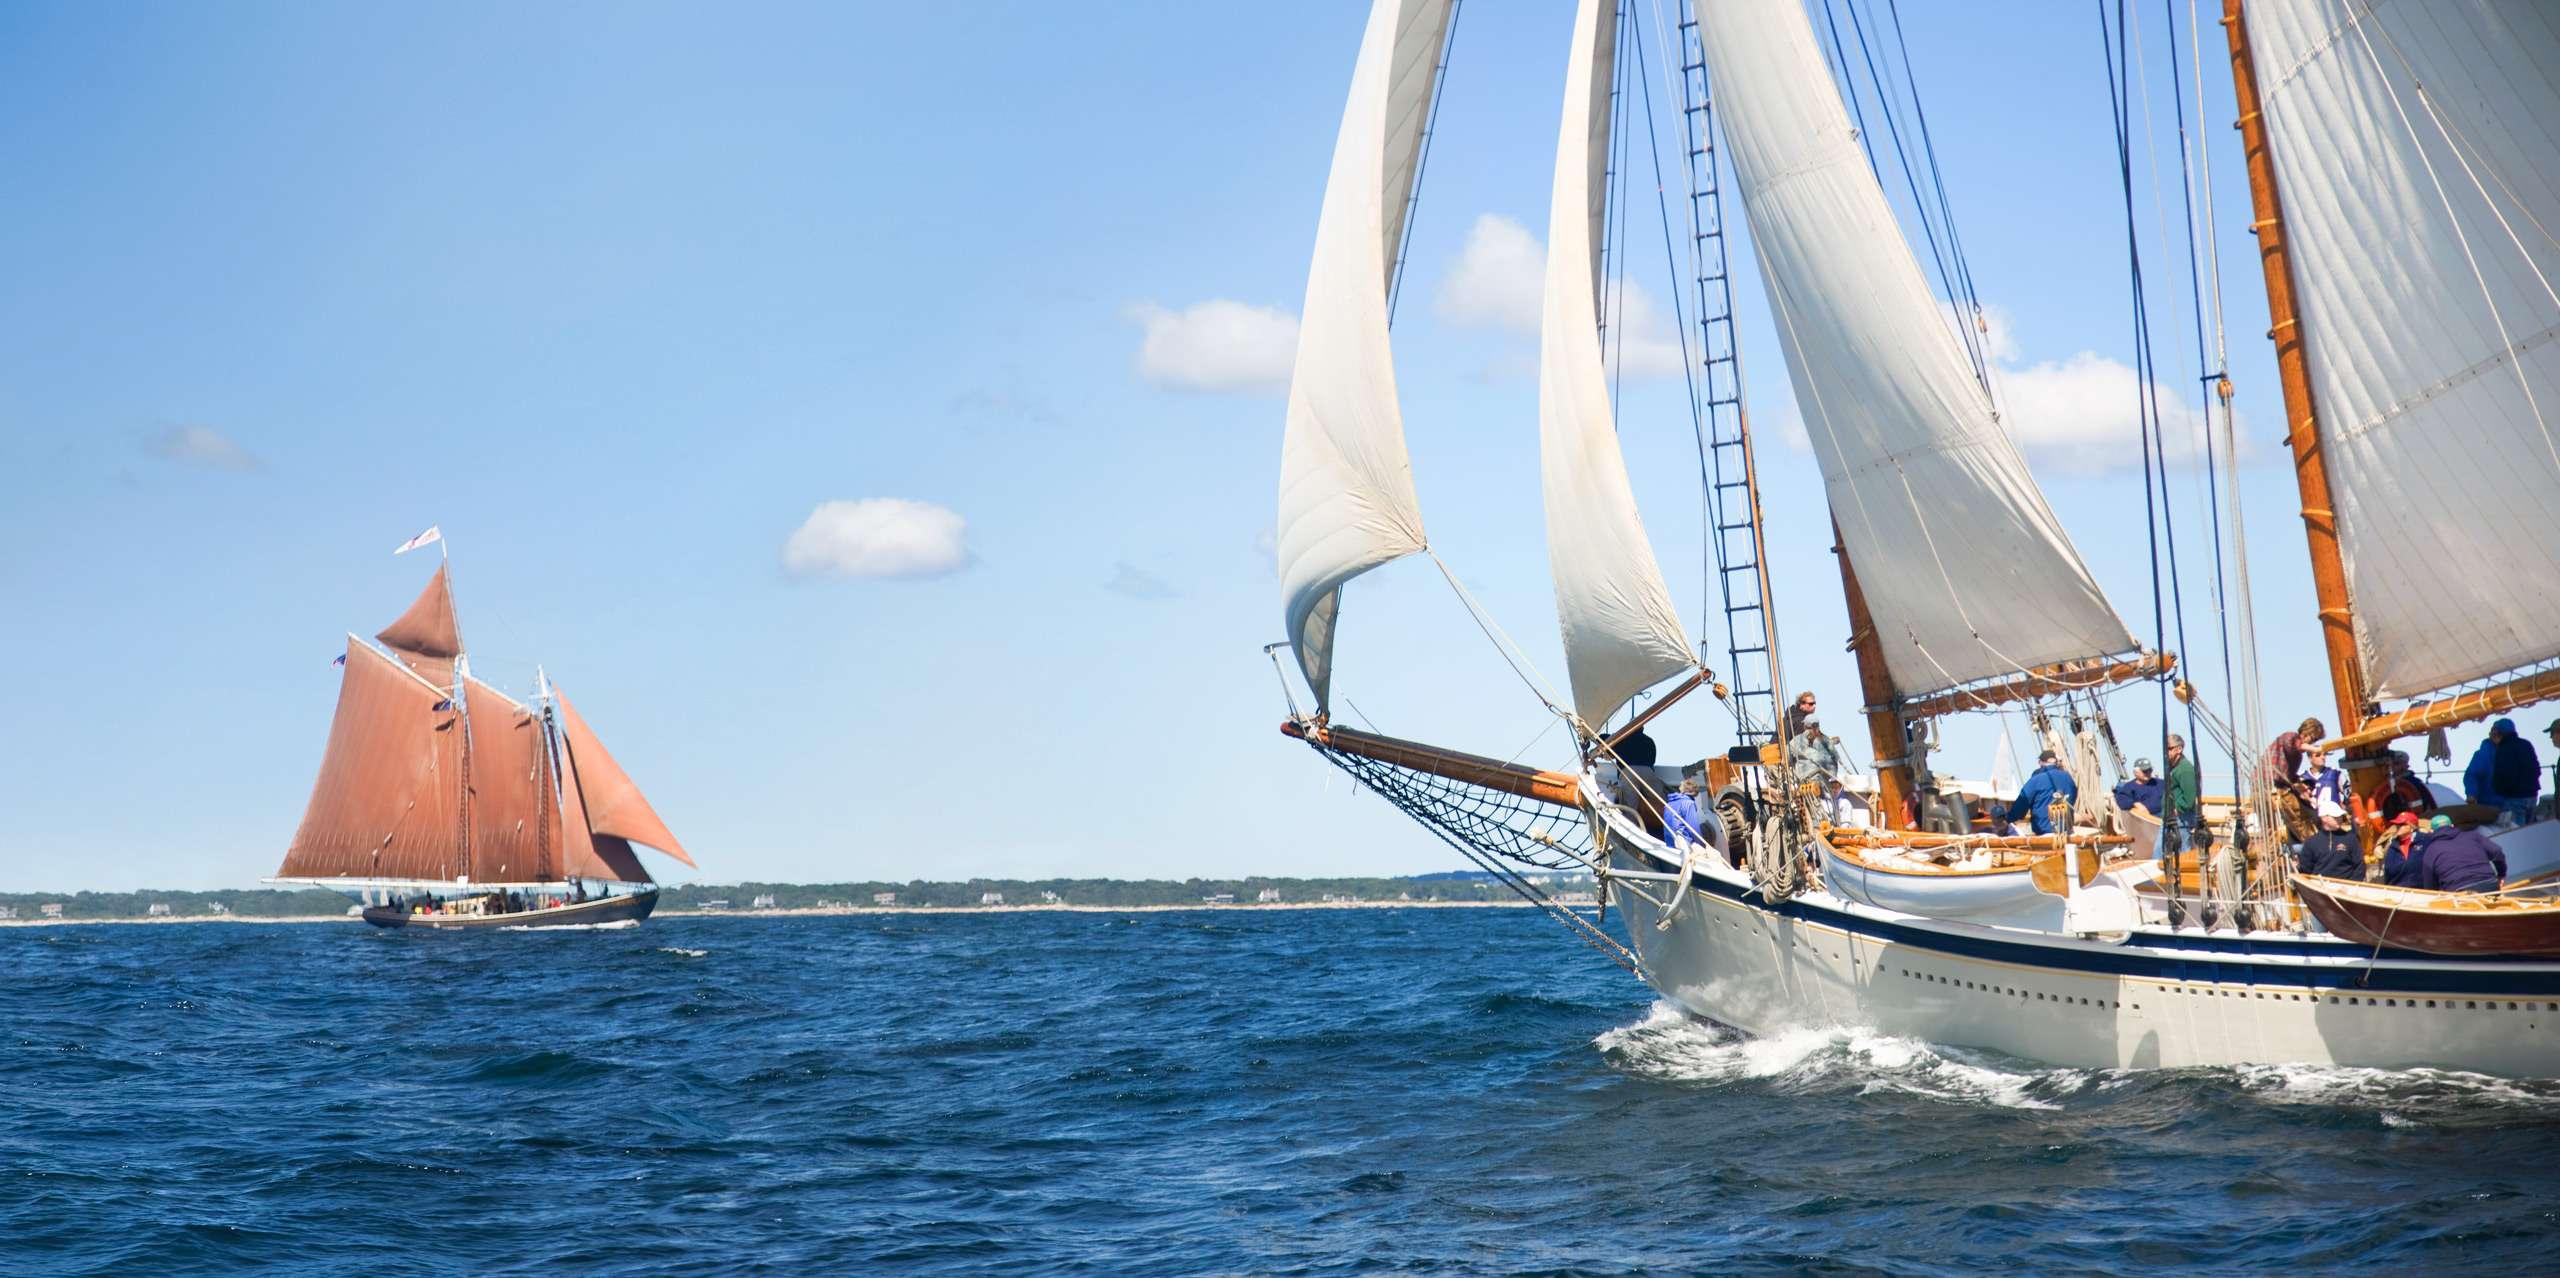 PORTFOLIO - Sailing - Windjammers #17   PCG452